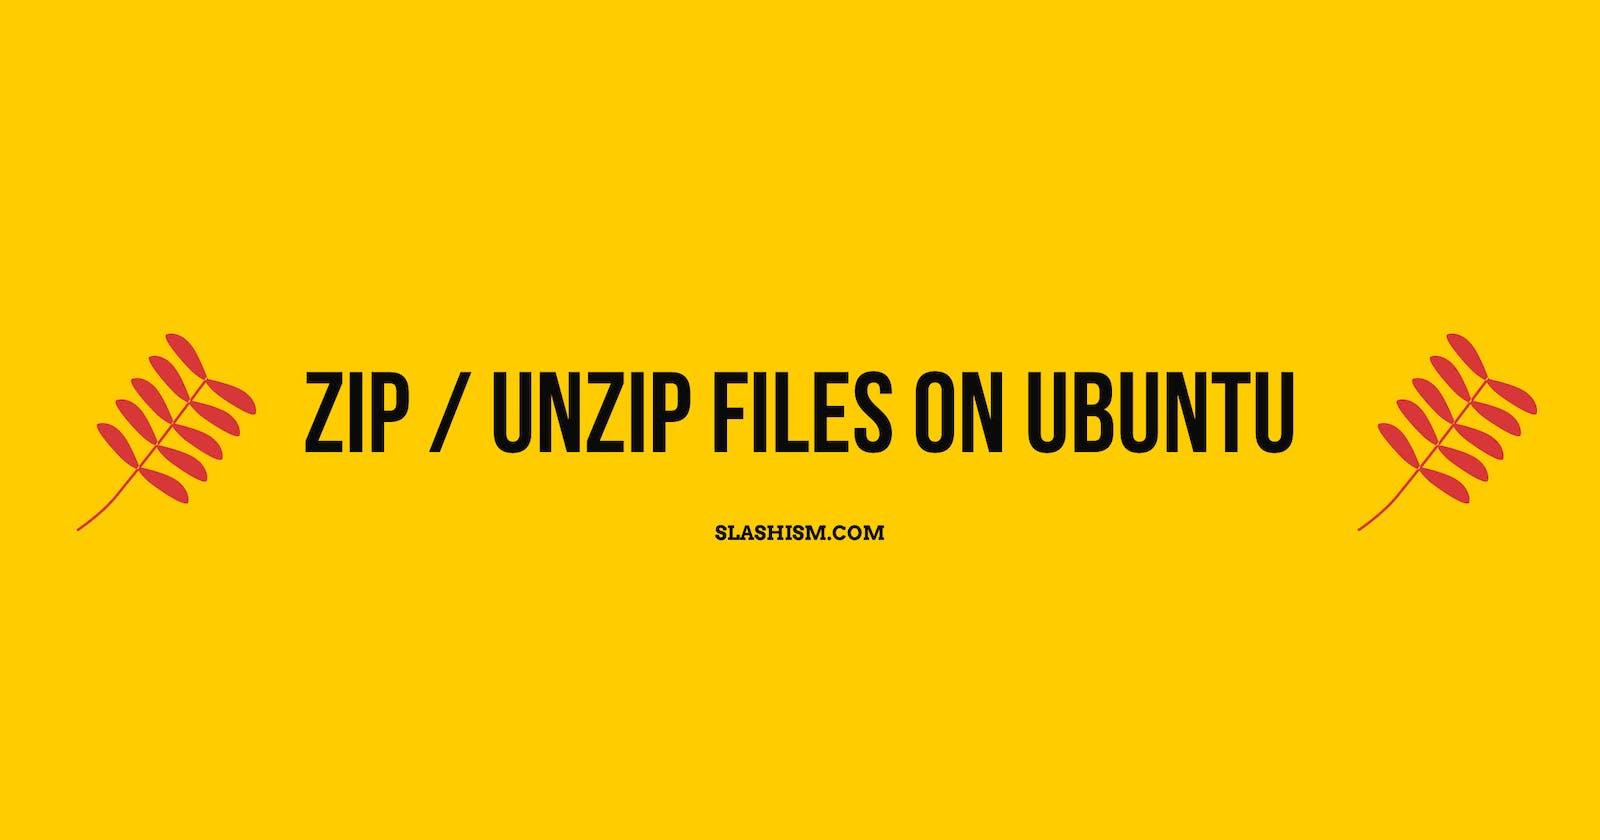 Zip and unzip files and folders in Ubuntu